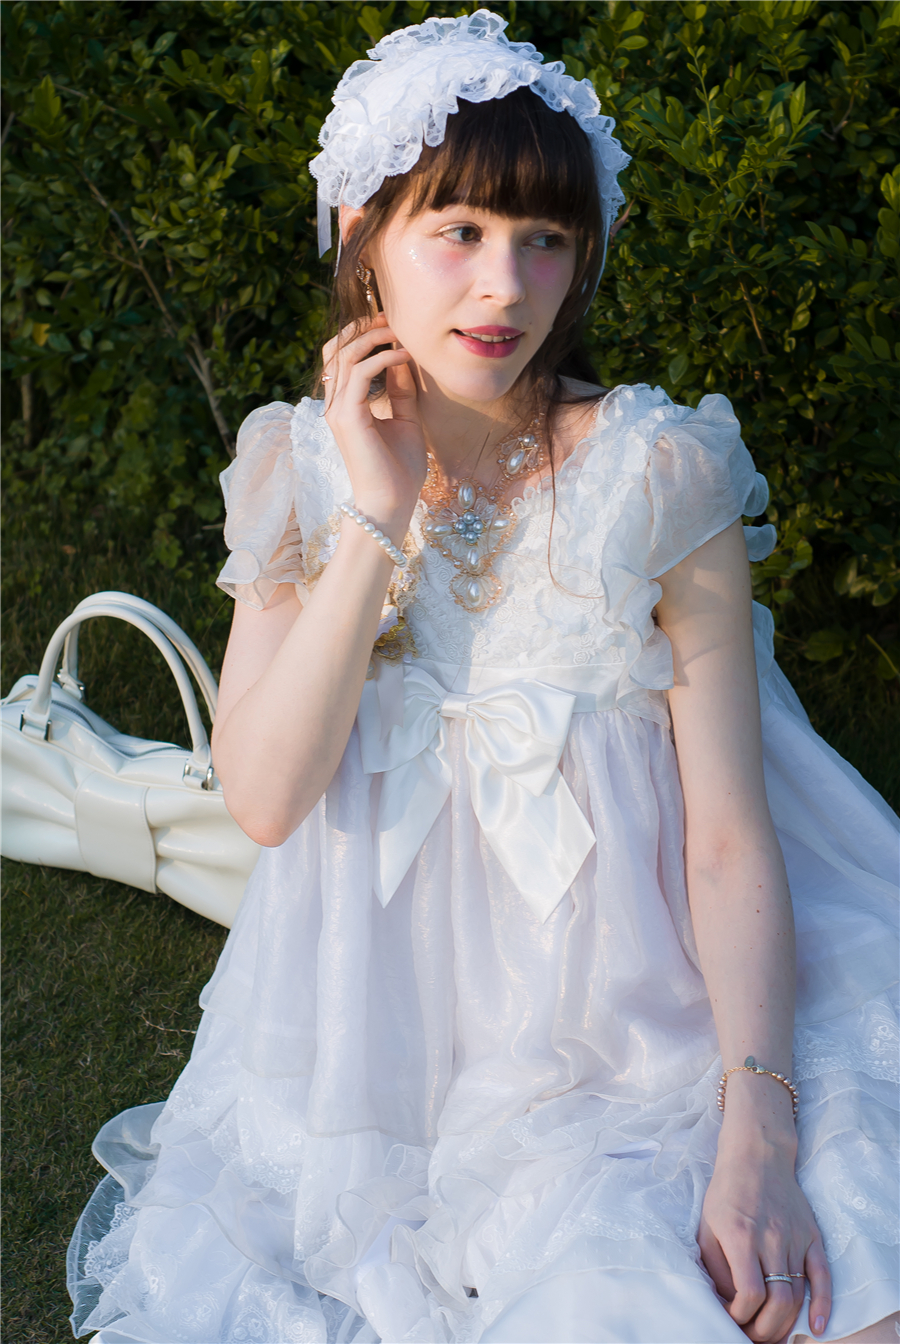 BabyPonytail_modelclaudia_Present Angel White JSK park08.jpg